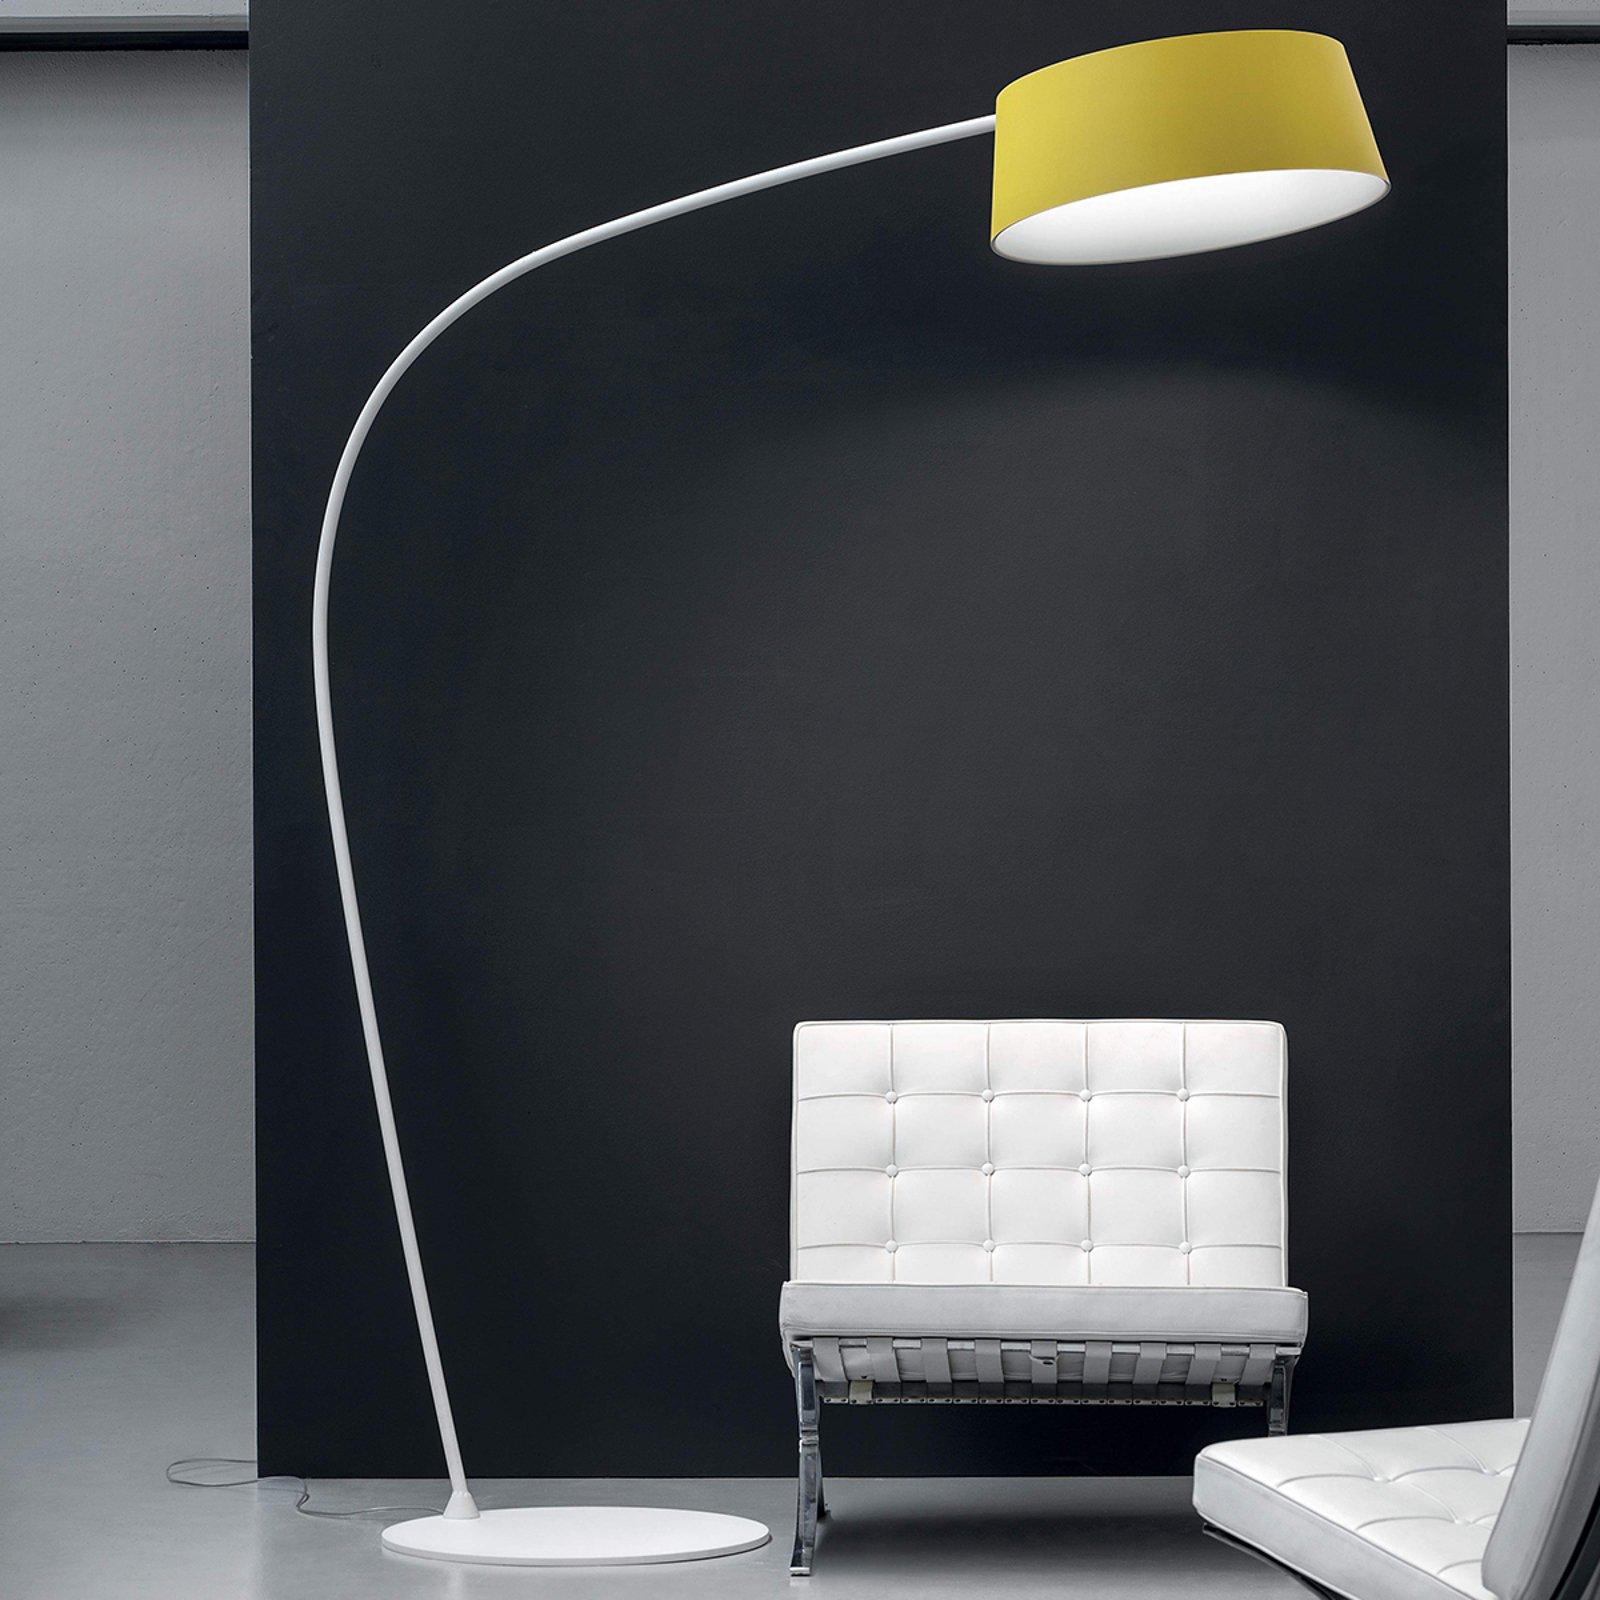 Oxygen_FL1 fargerik LED-buelampe, justerbar